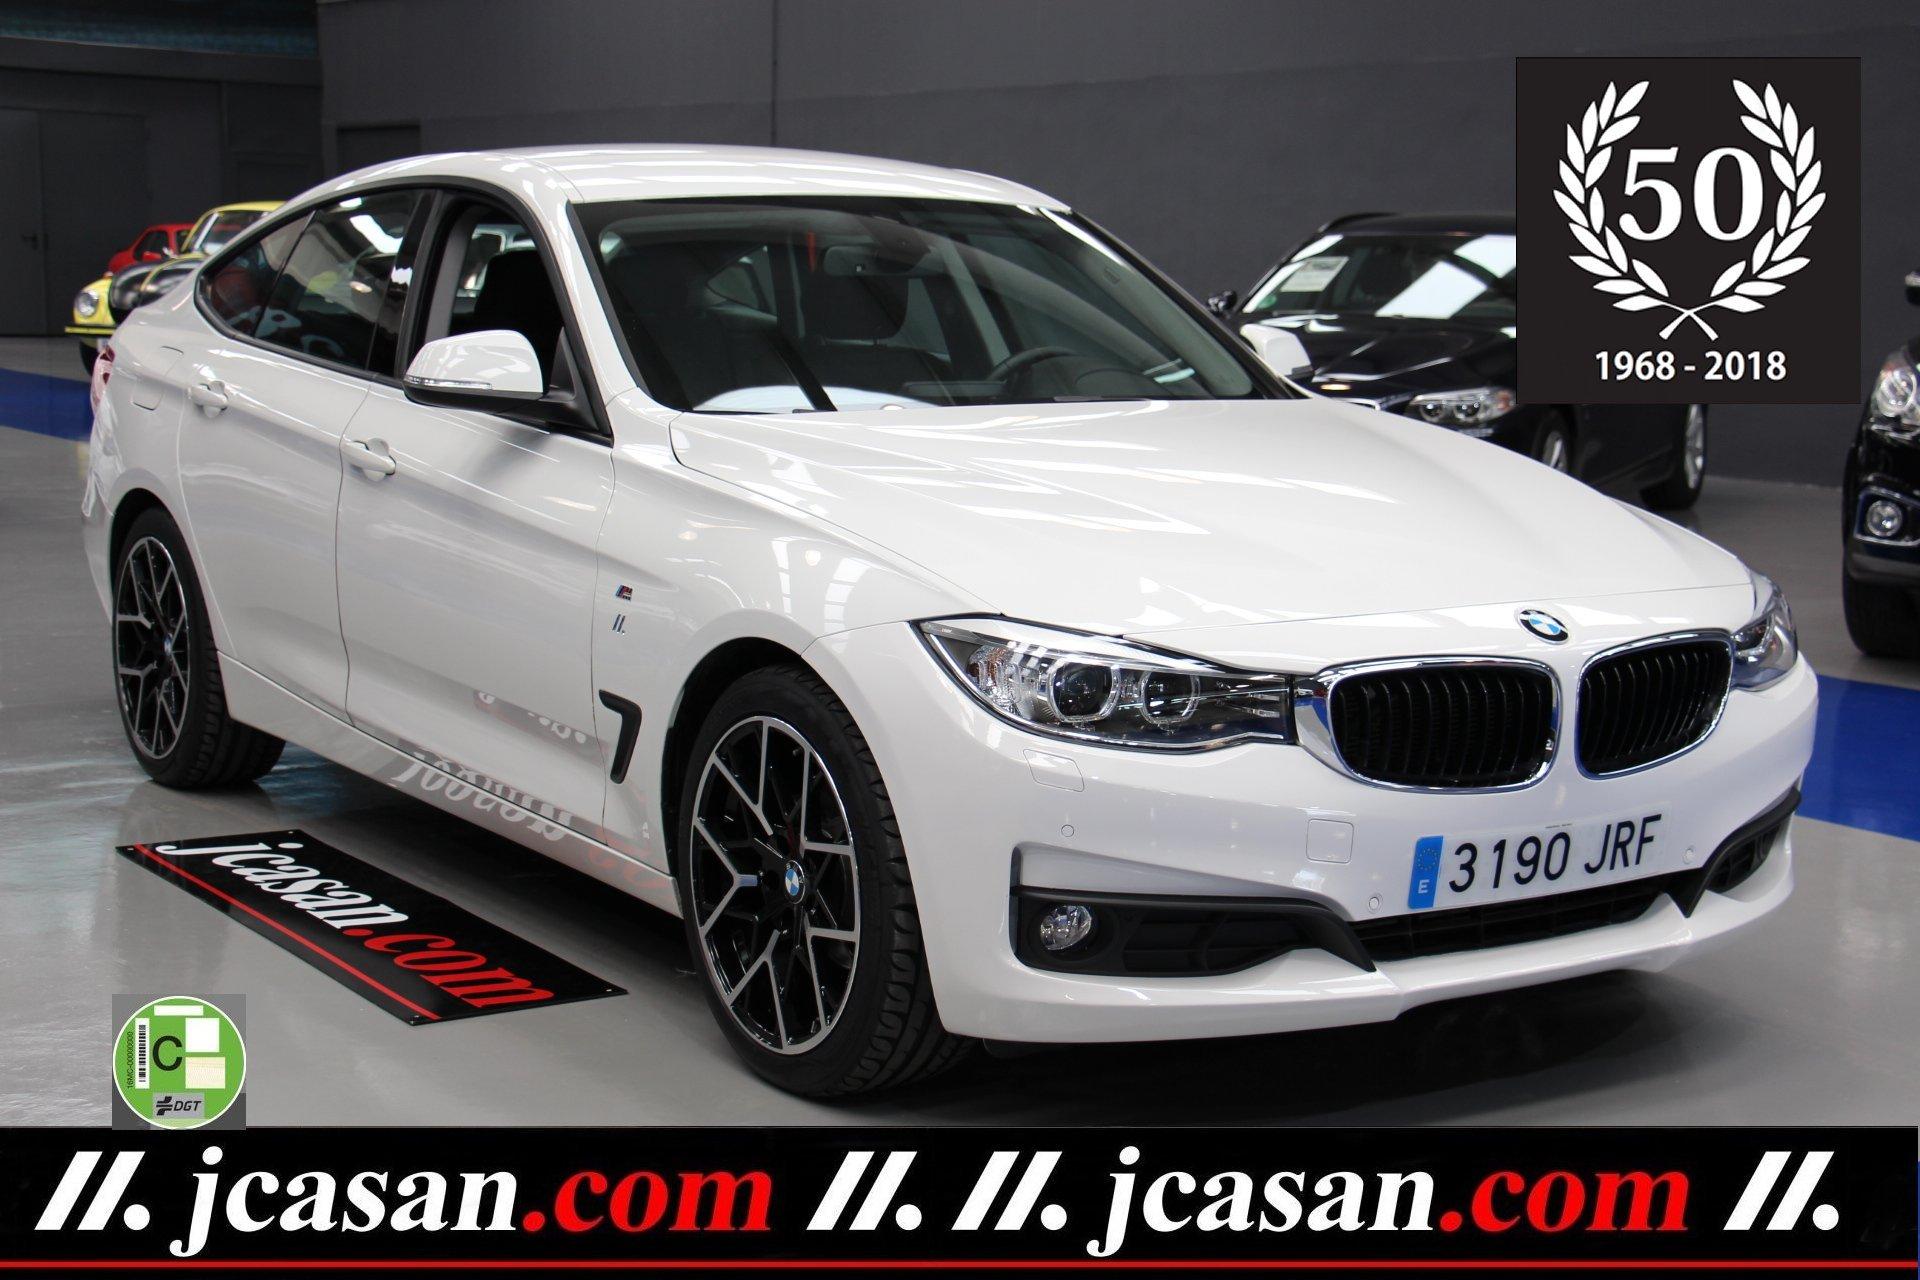 BMW 318d GT 2.0d 150 CV E6 White